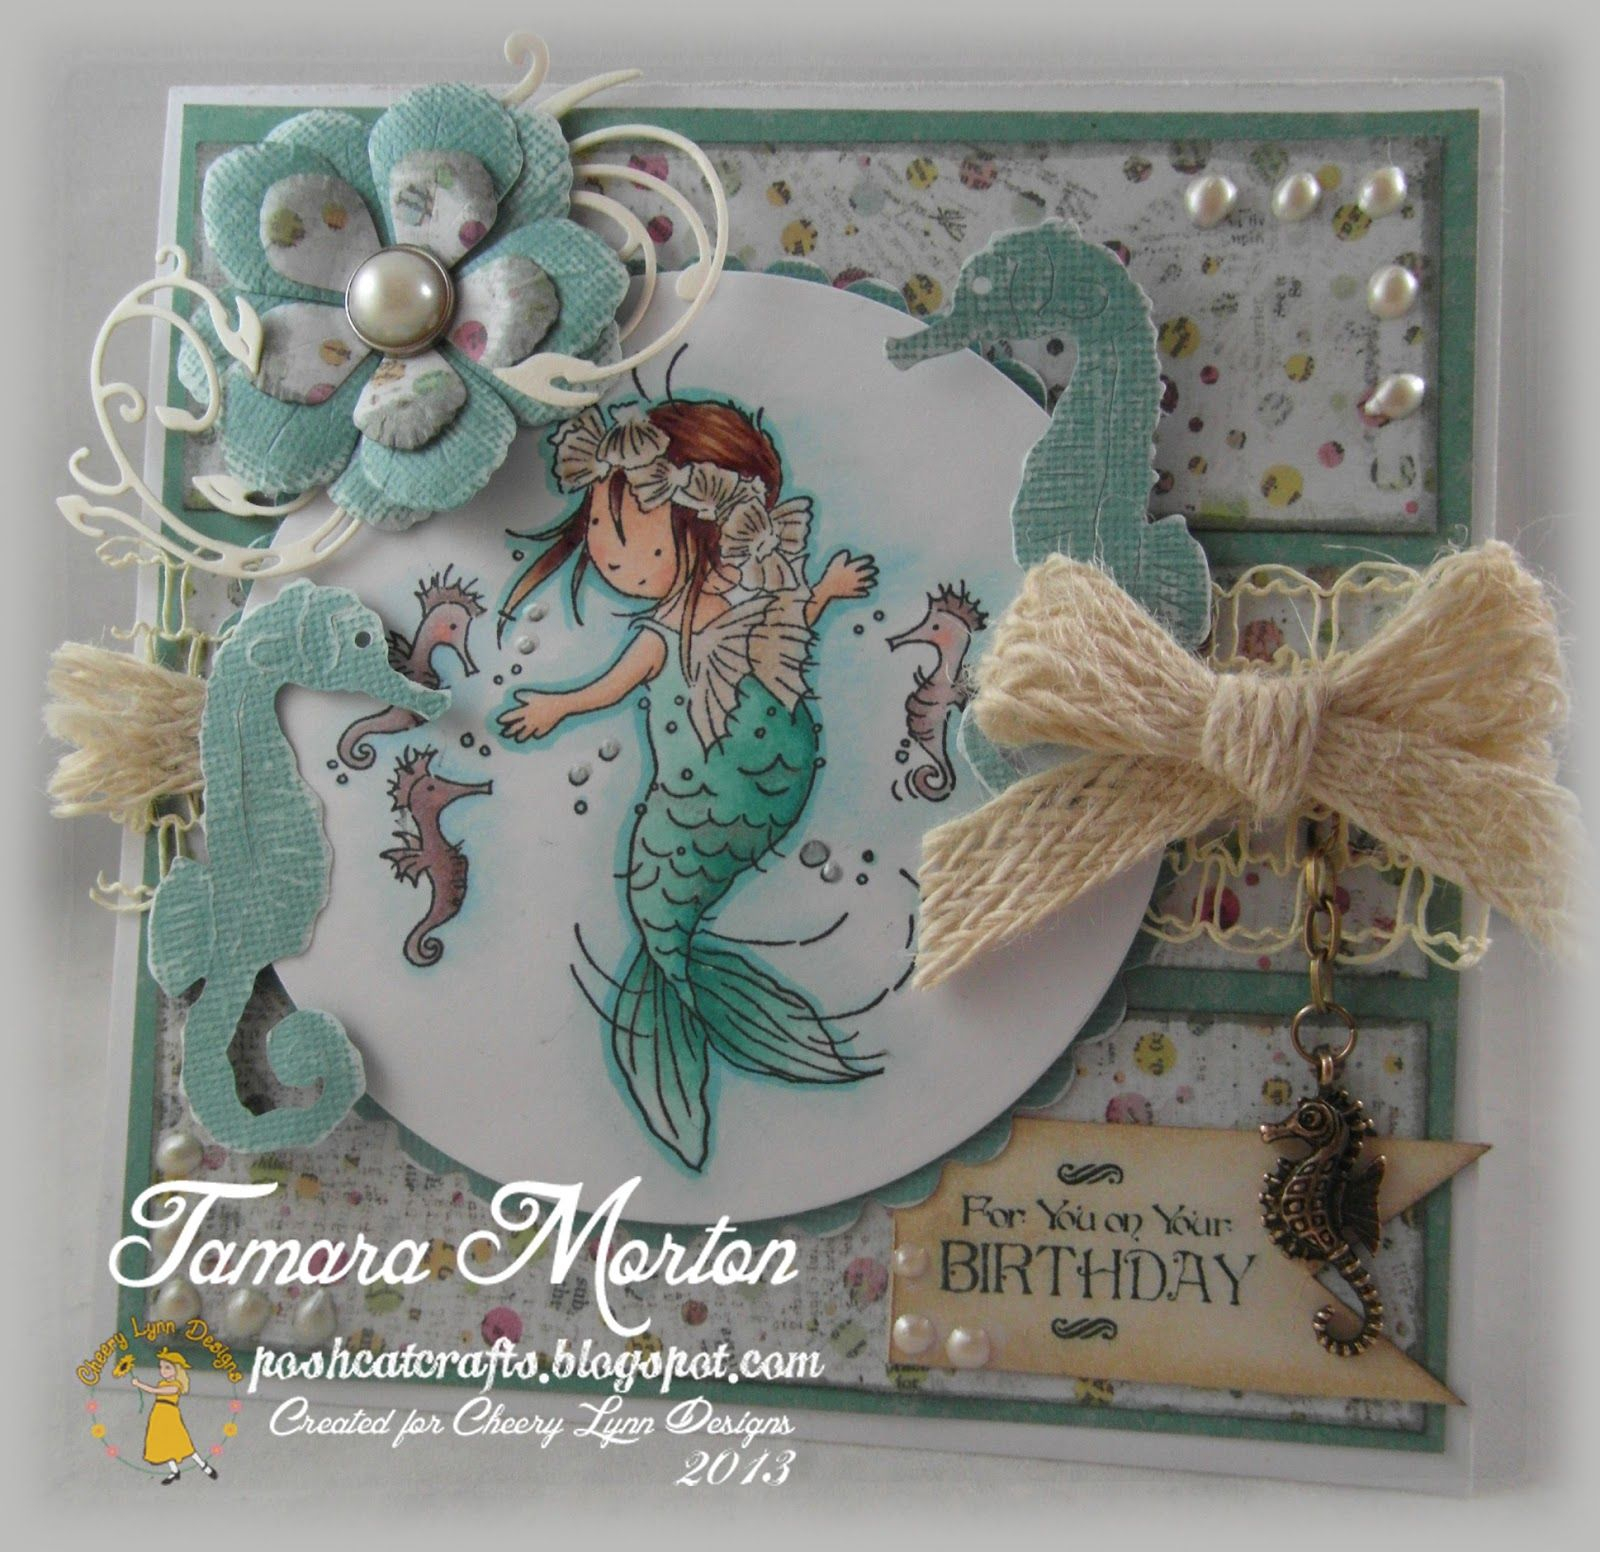 Cheery lynn designs blog cards tags bags u envies pinterest